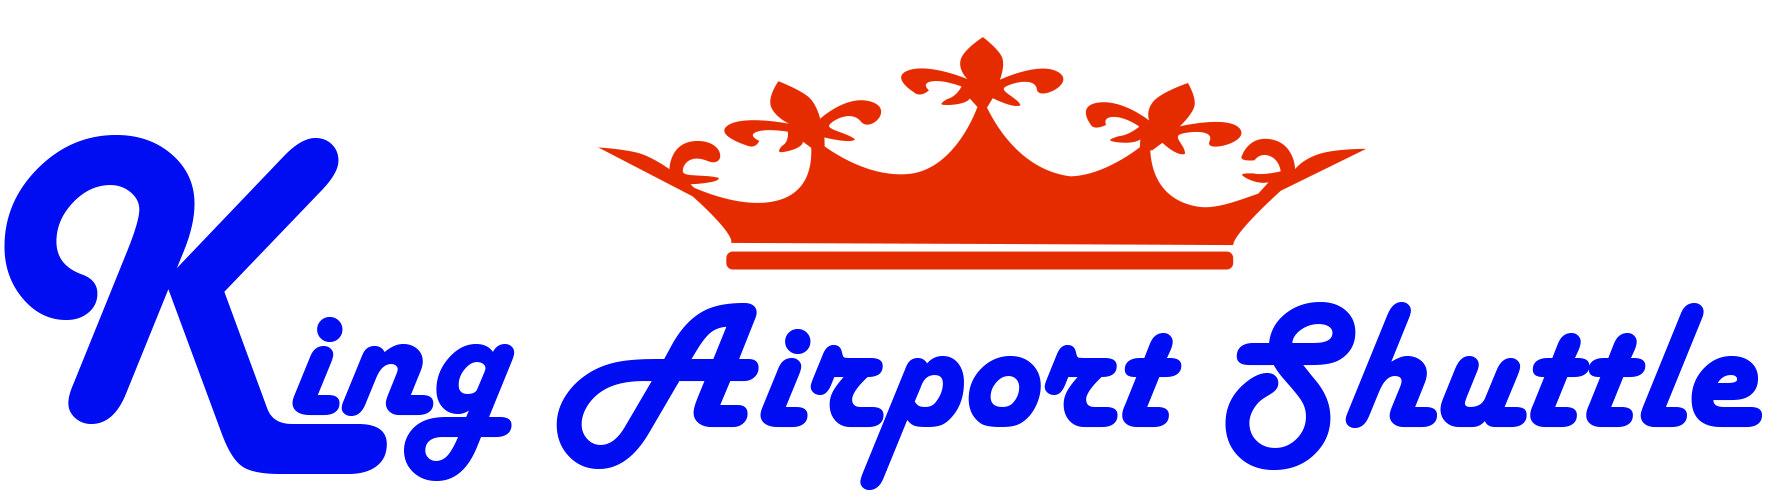 King Airport Shuttle Logo